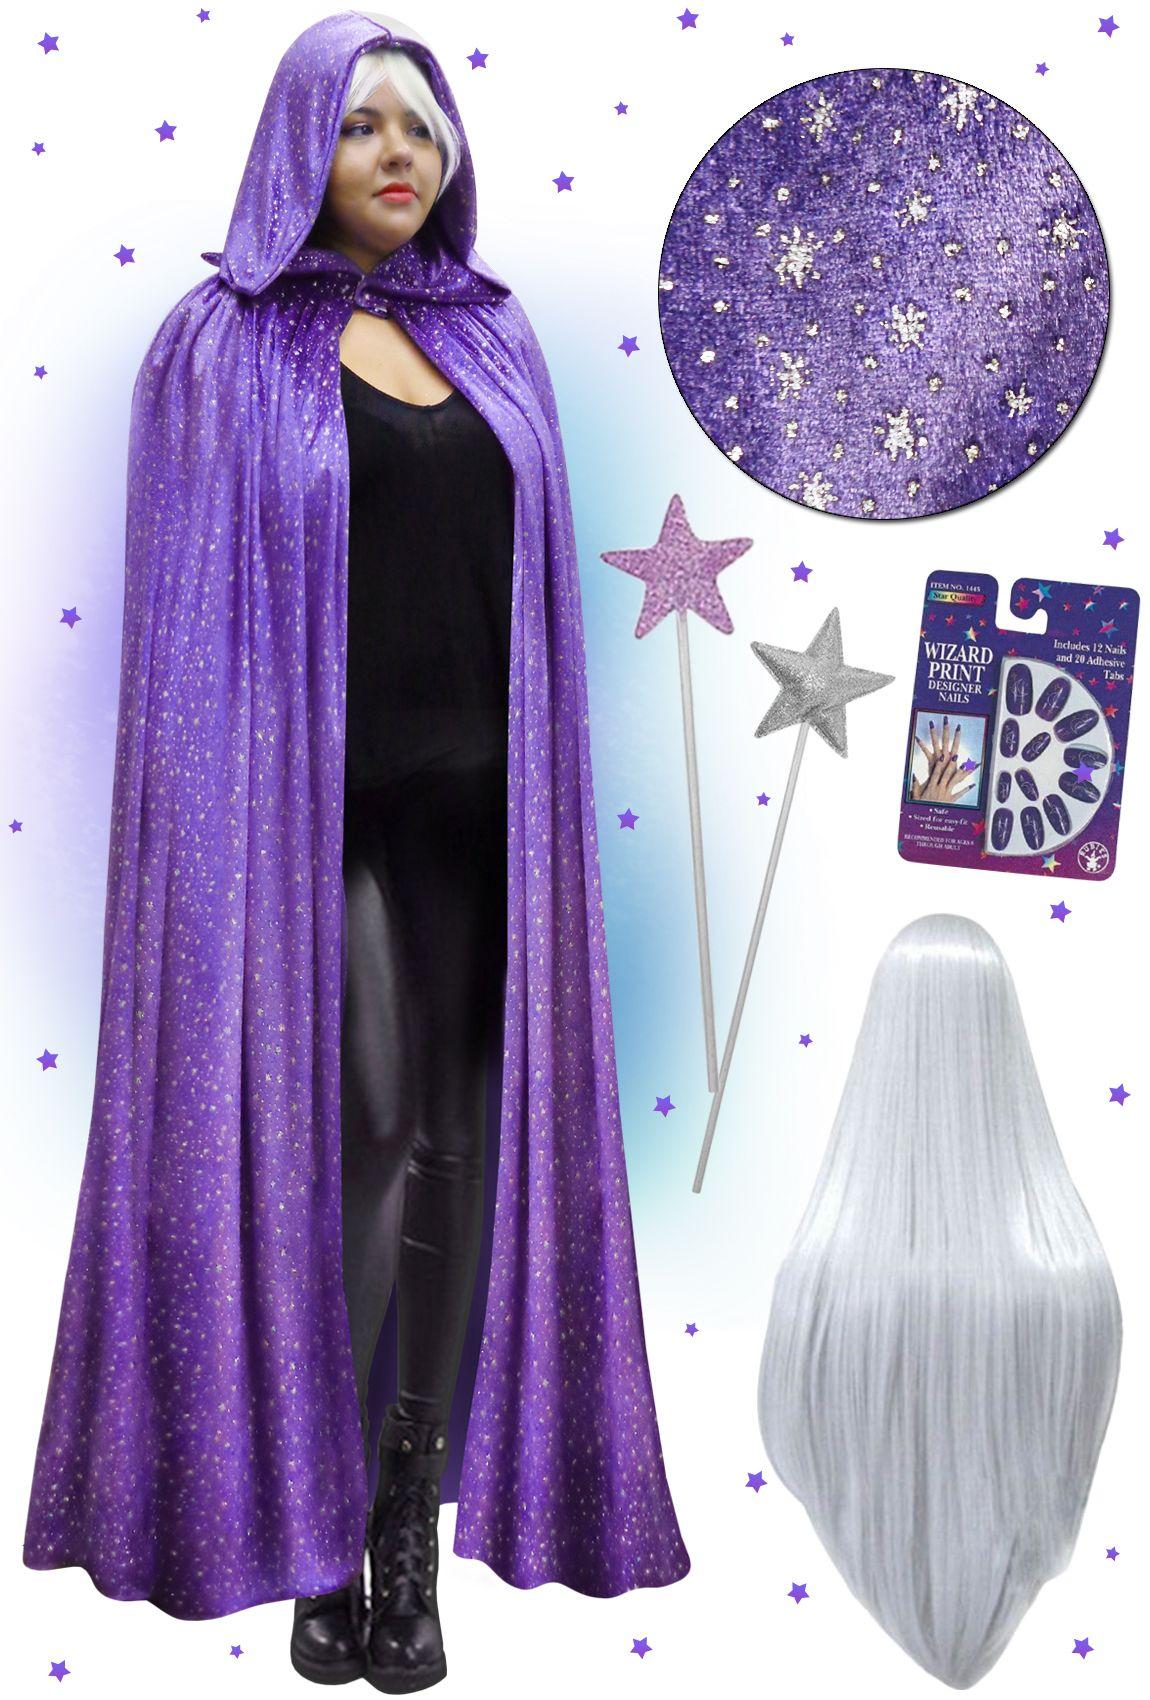 NEW! Plus Size Purple Wizard Hooded Cape Halloween Costume